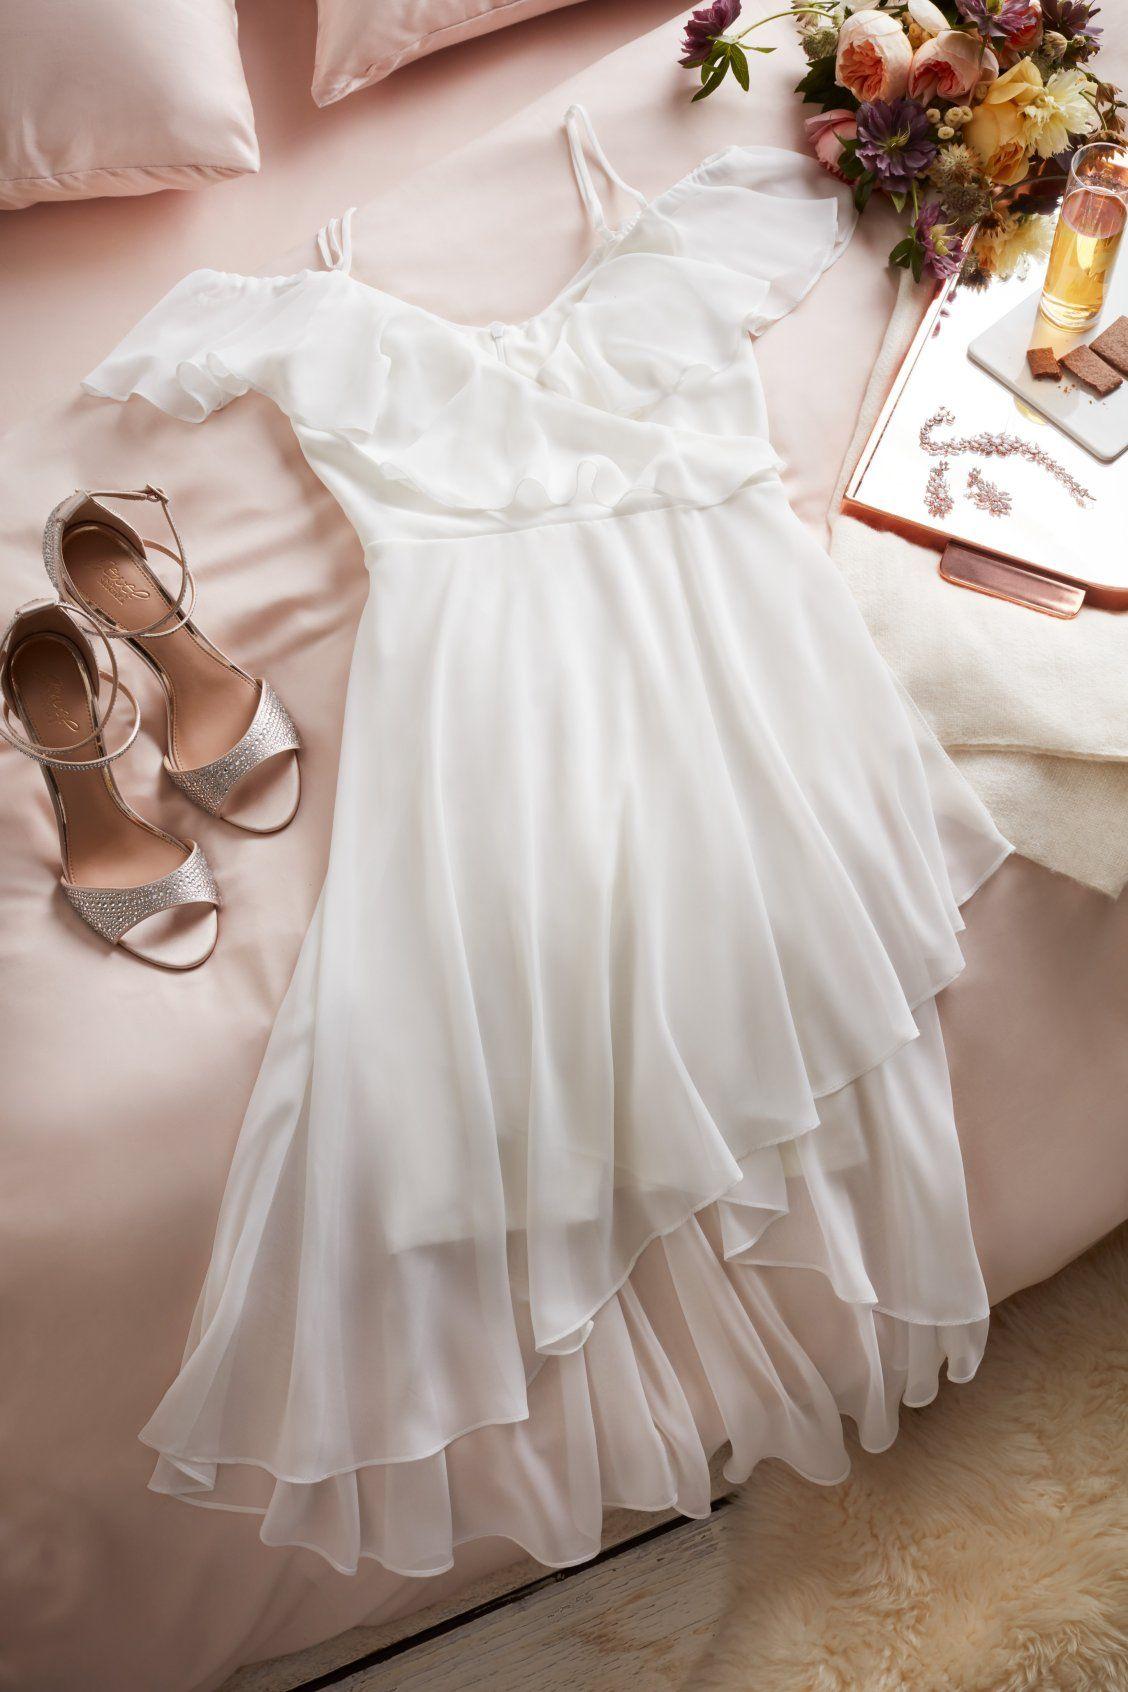 Flounced Cold Shoulder Short FauxWrap Dress (With images